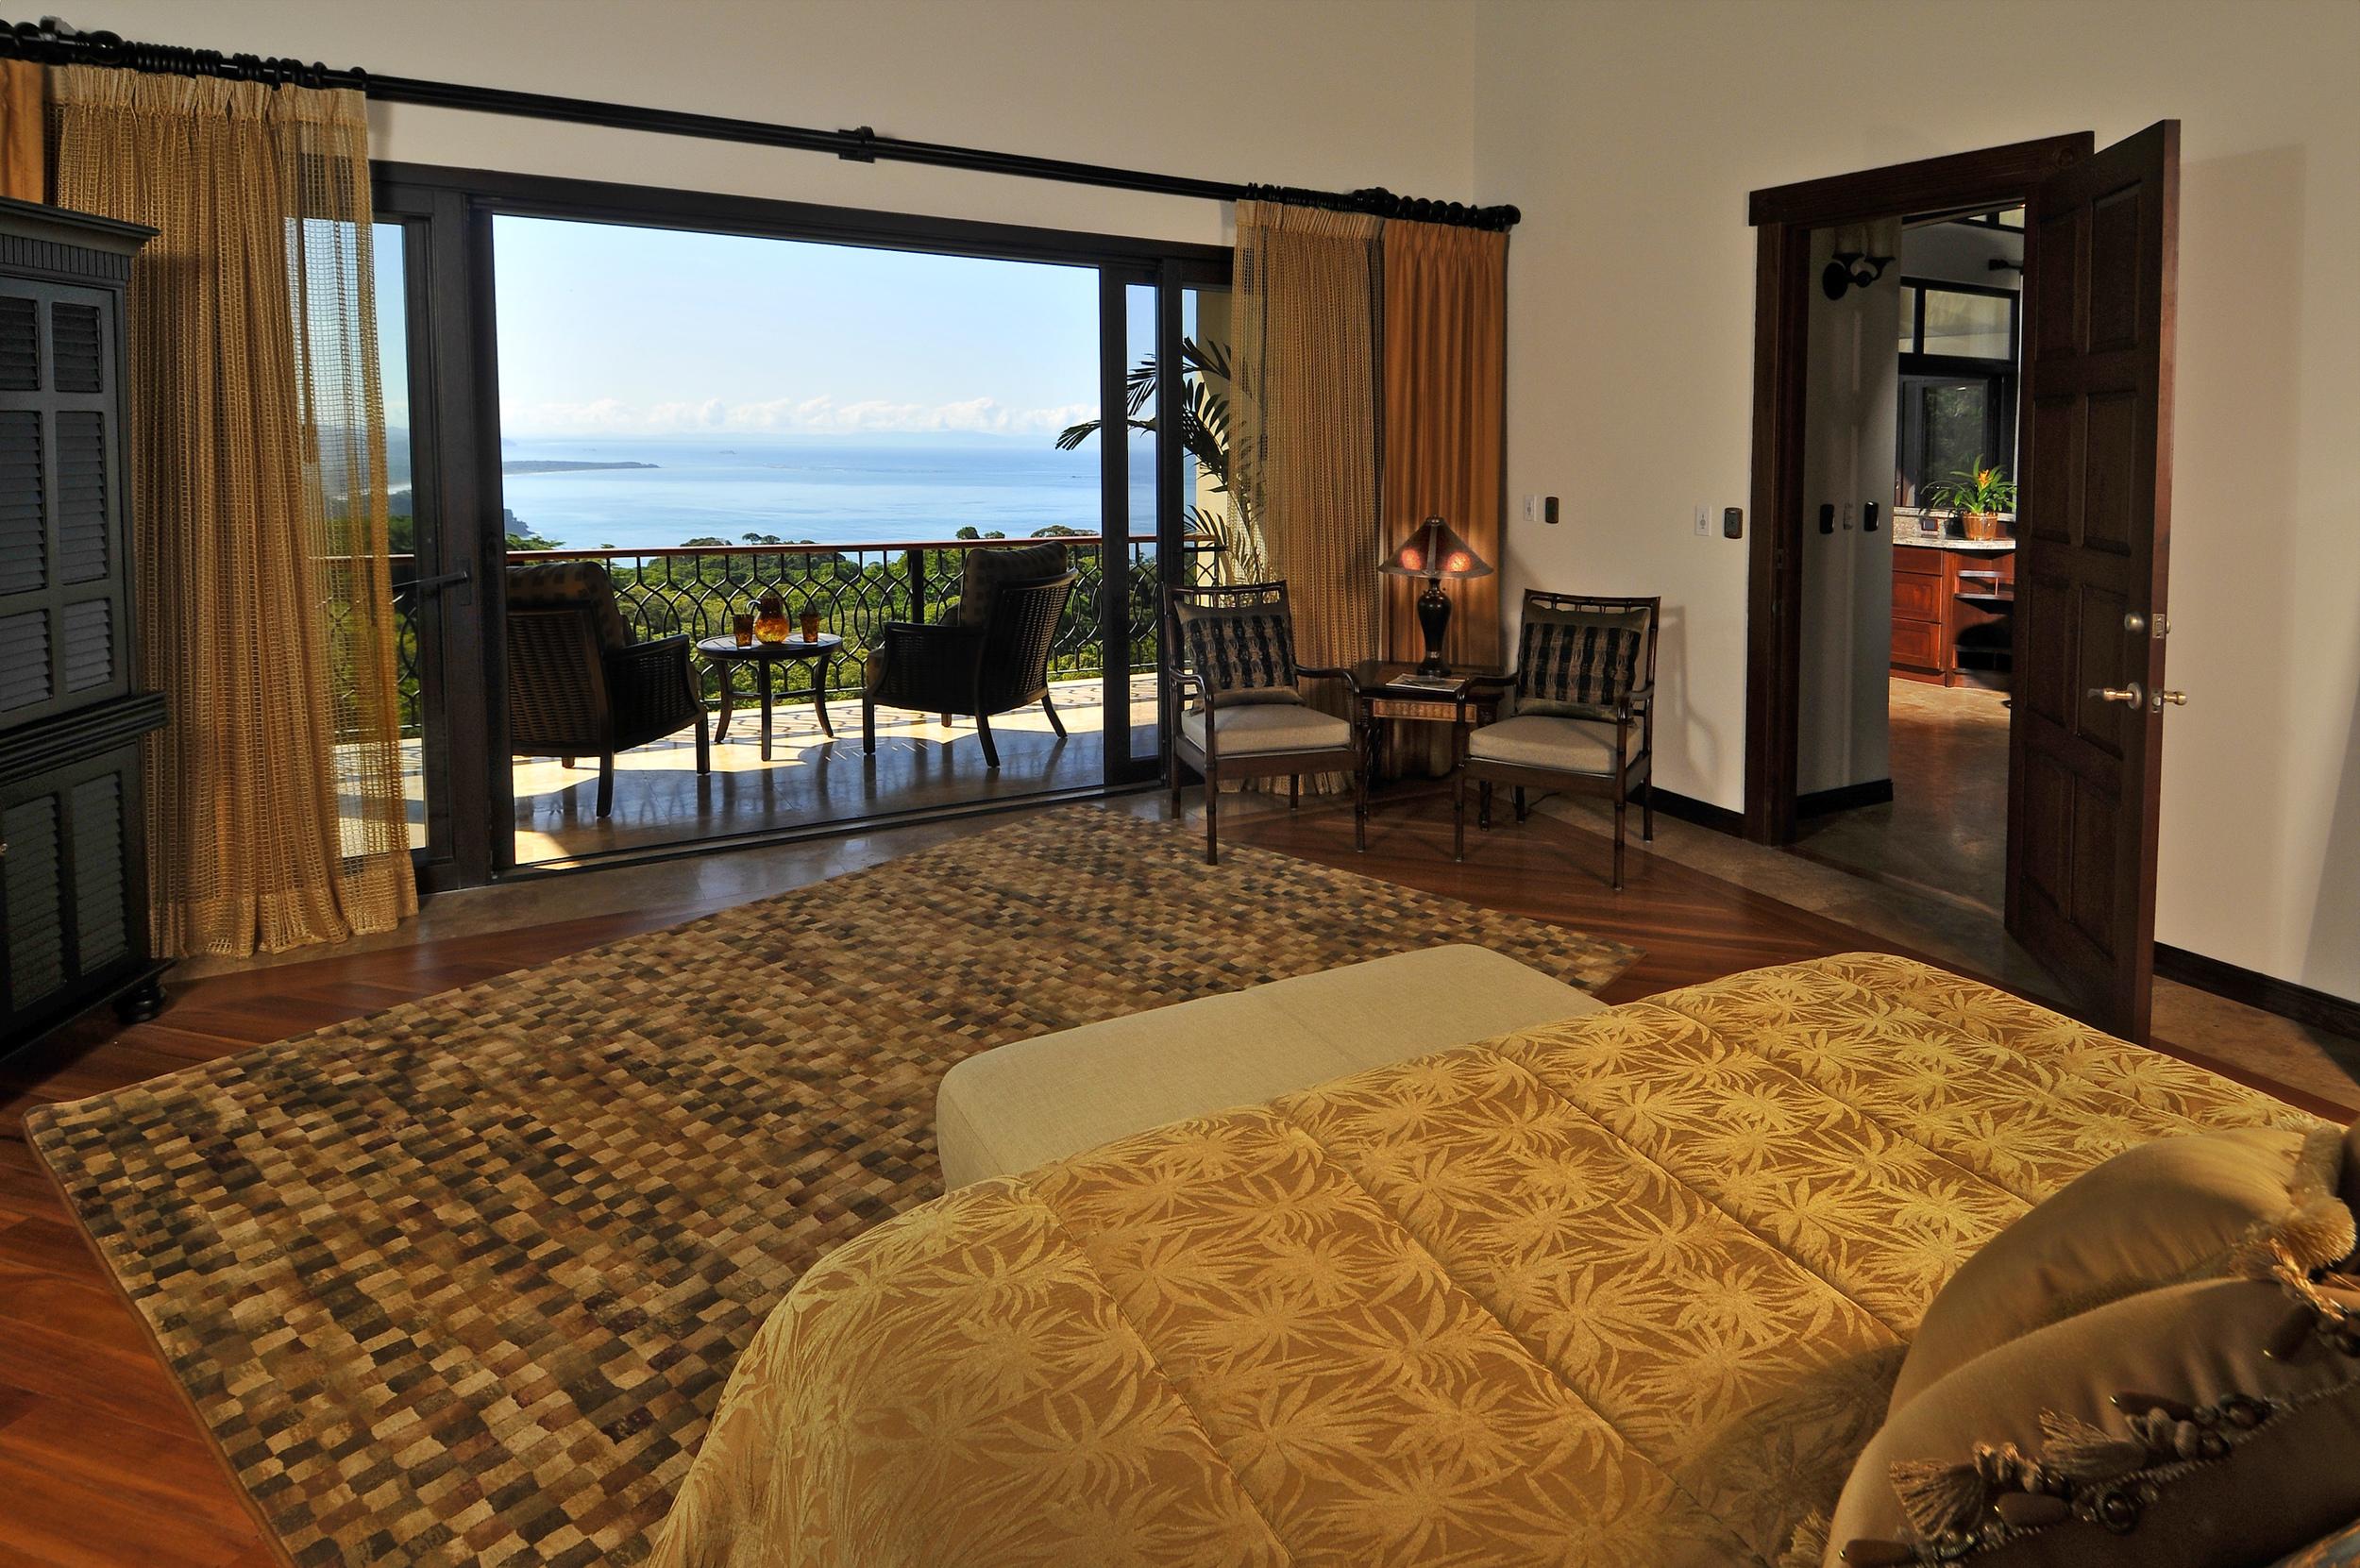 flex5-yoga-retreat-costa-rica-villa-king-suite-bedroom-view.jpg